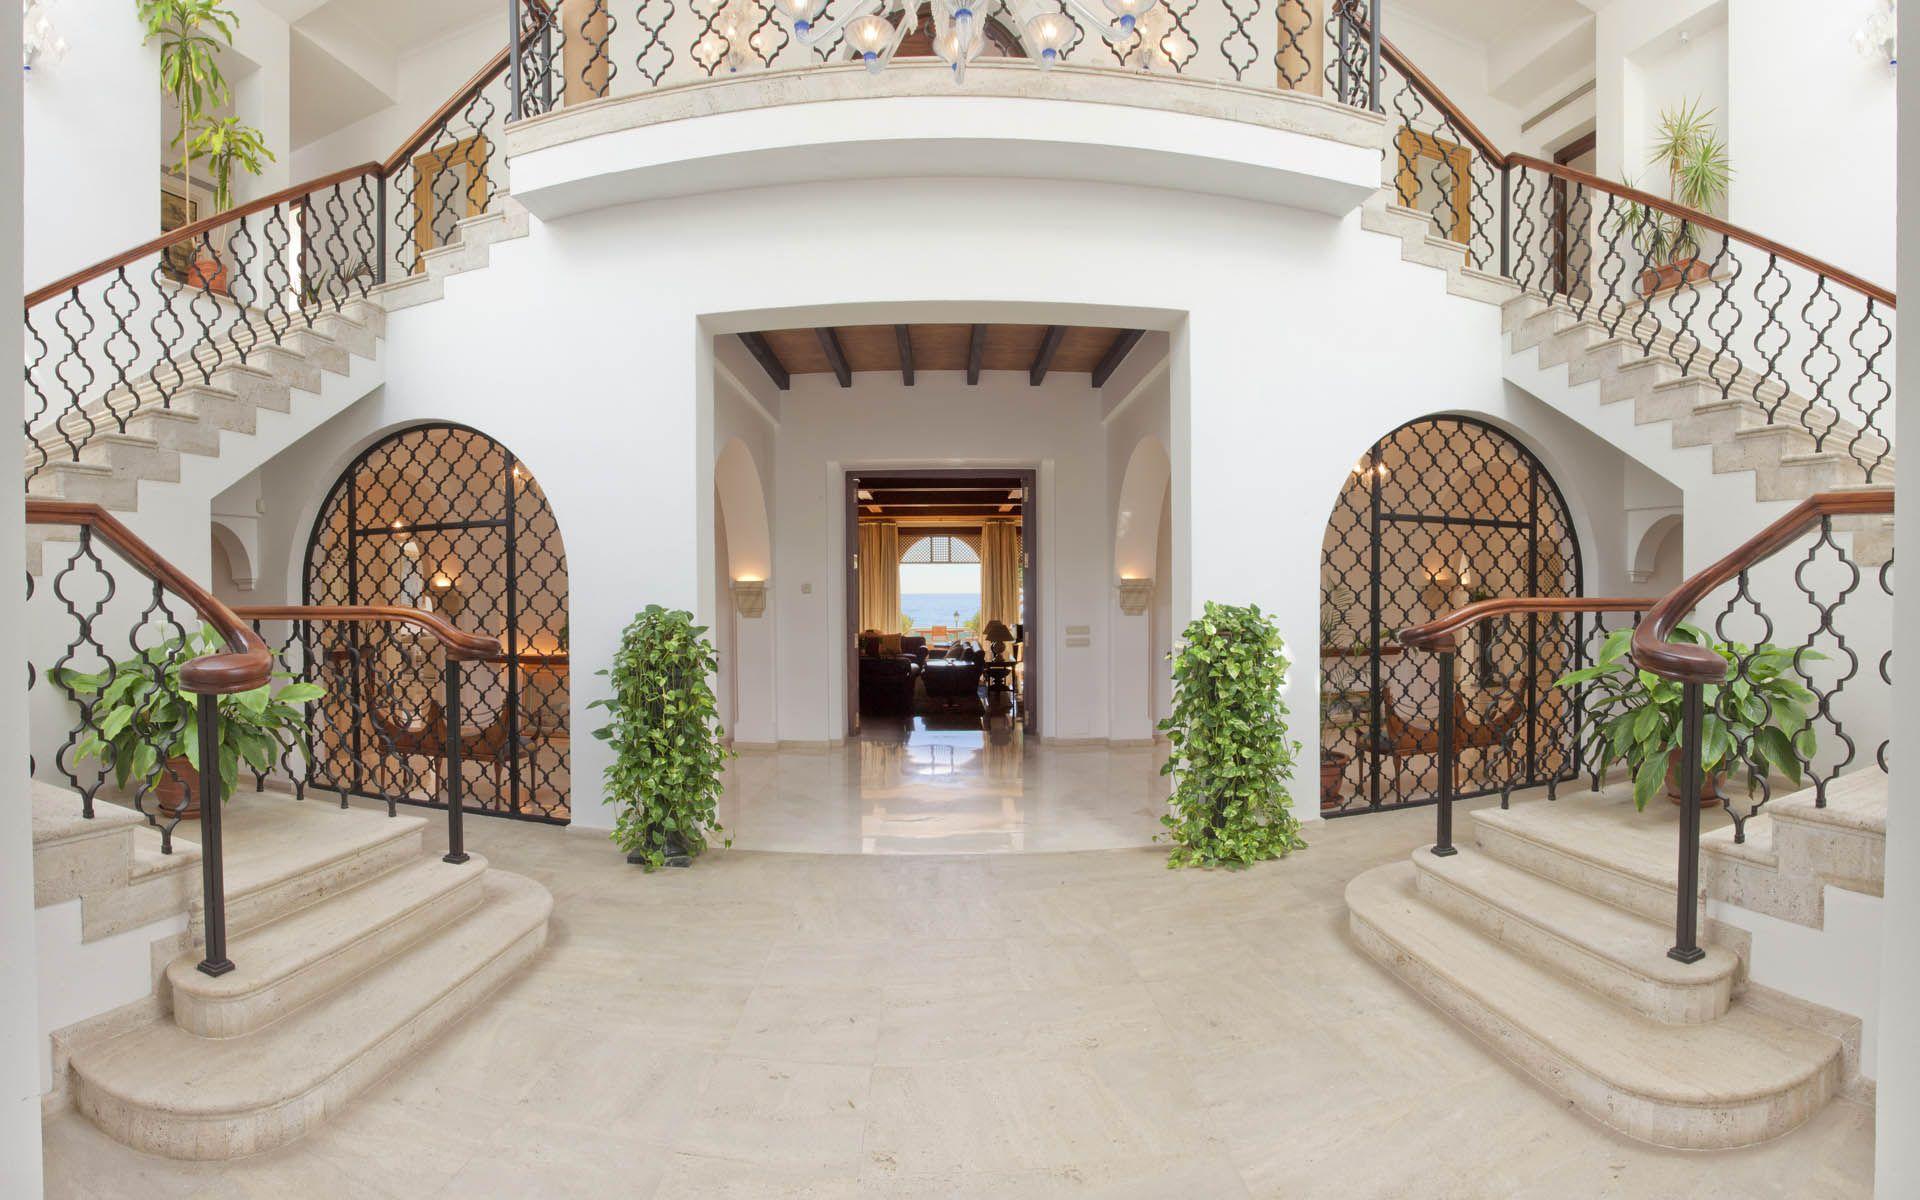 Luxury Villa, Villa Arte, Marbella, Spain, Europe (photo ...